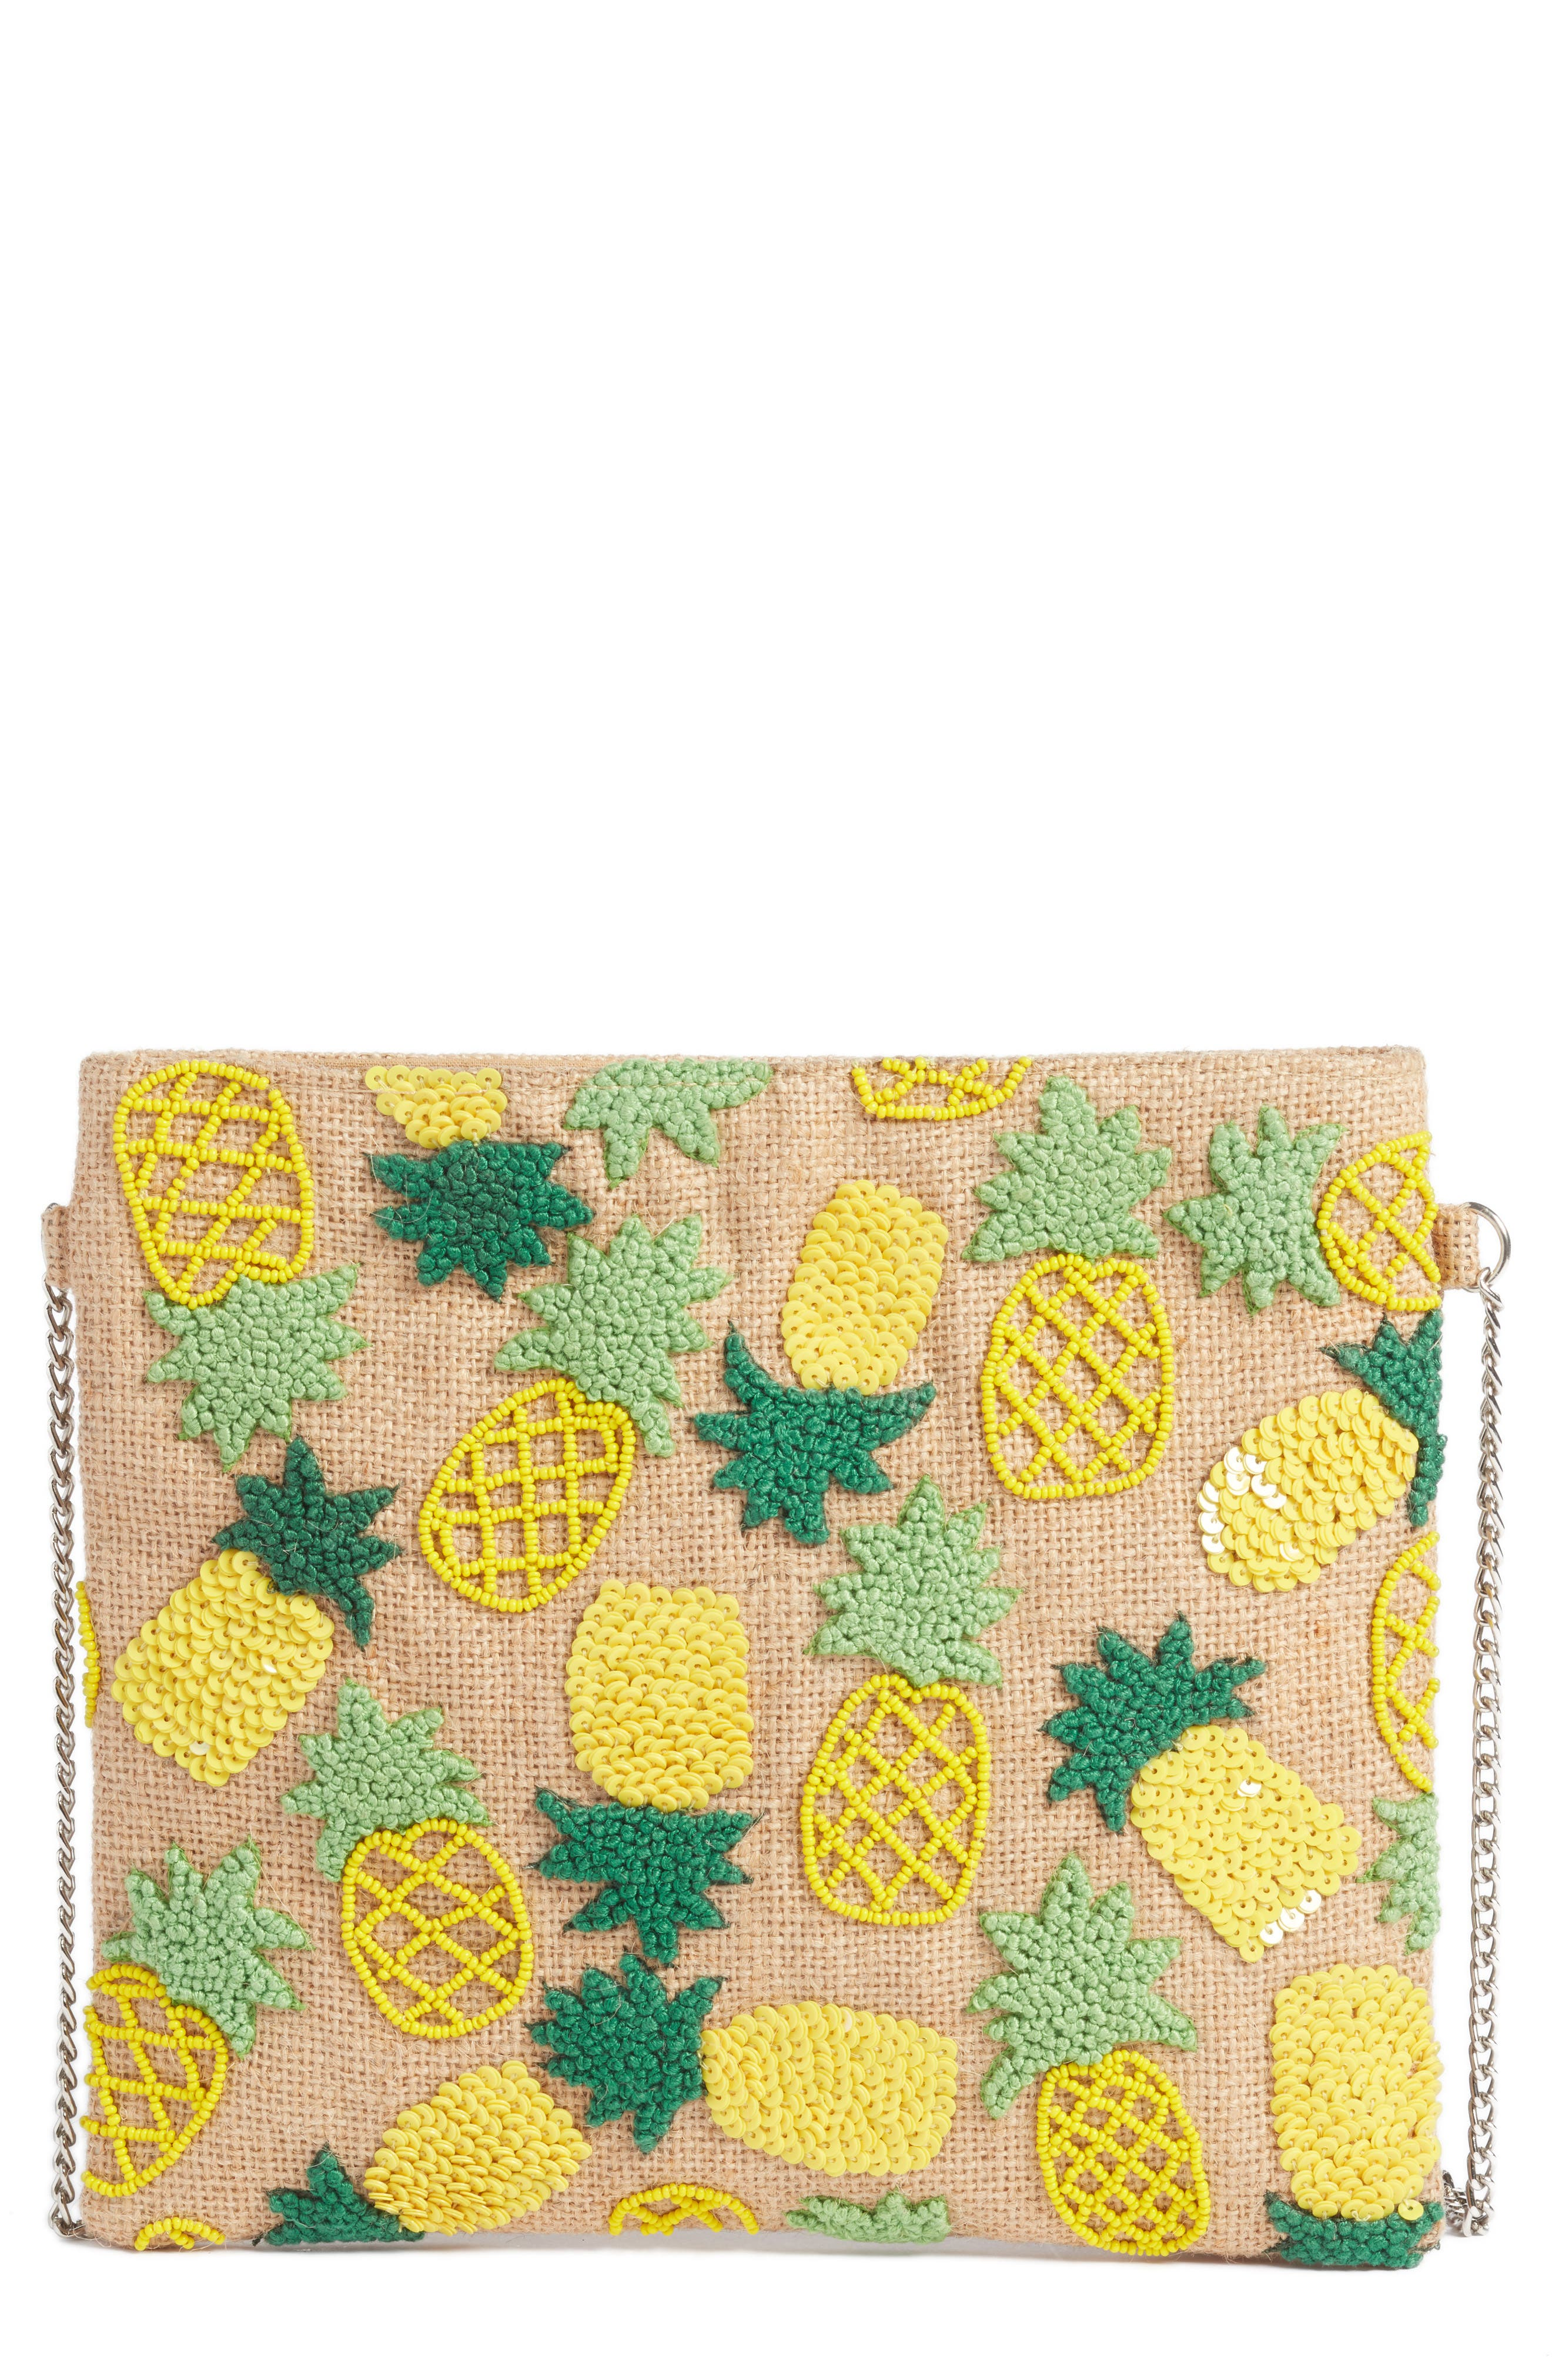 AREA STARS Pineapple Crossbody Bag - Pink in Natural